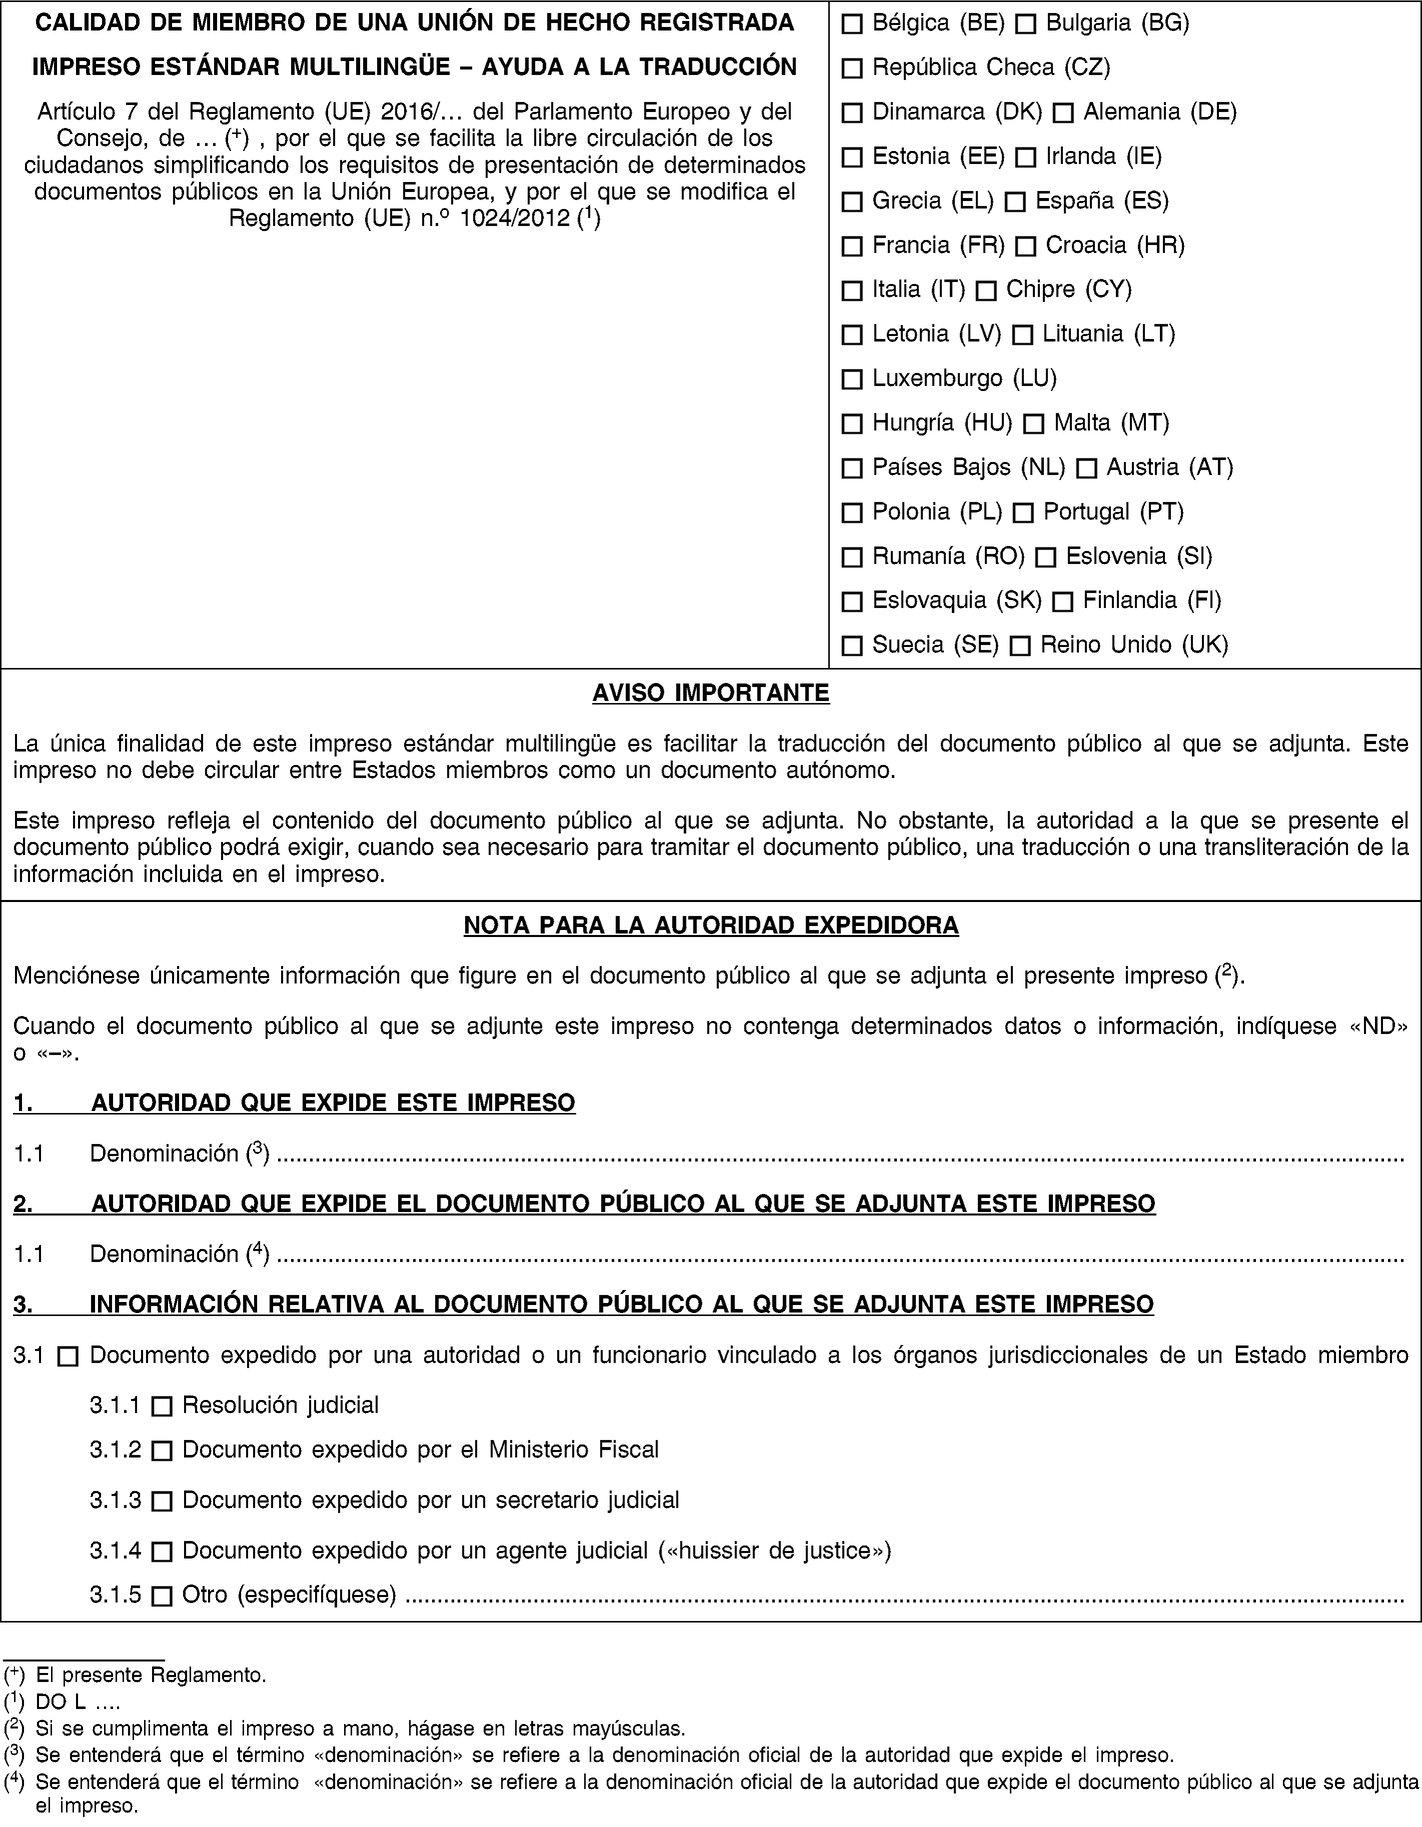 EUR-Lex - 52016AG0007(01) - EN - EUR-Lex